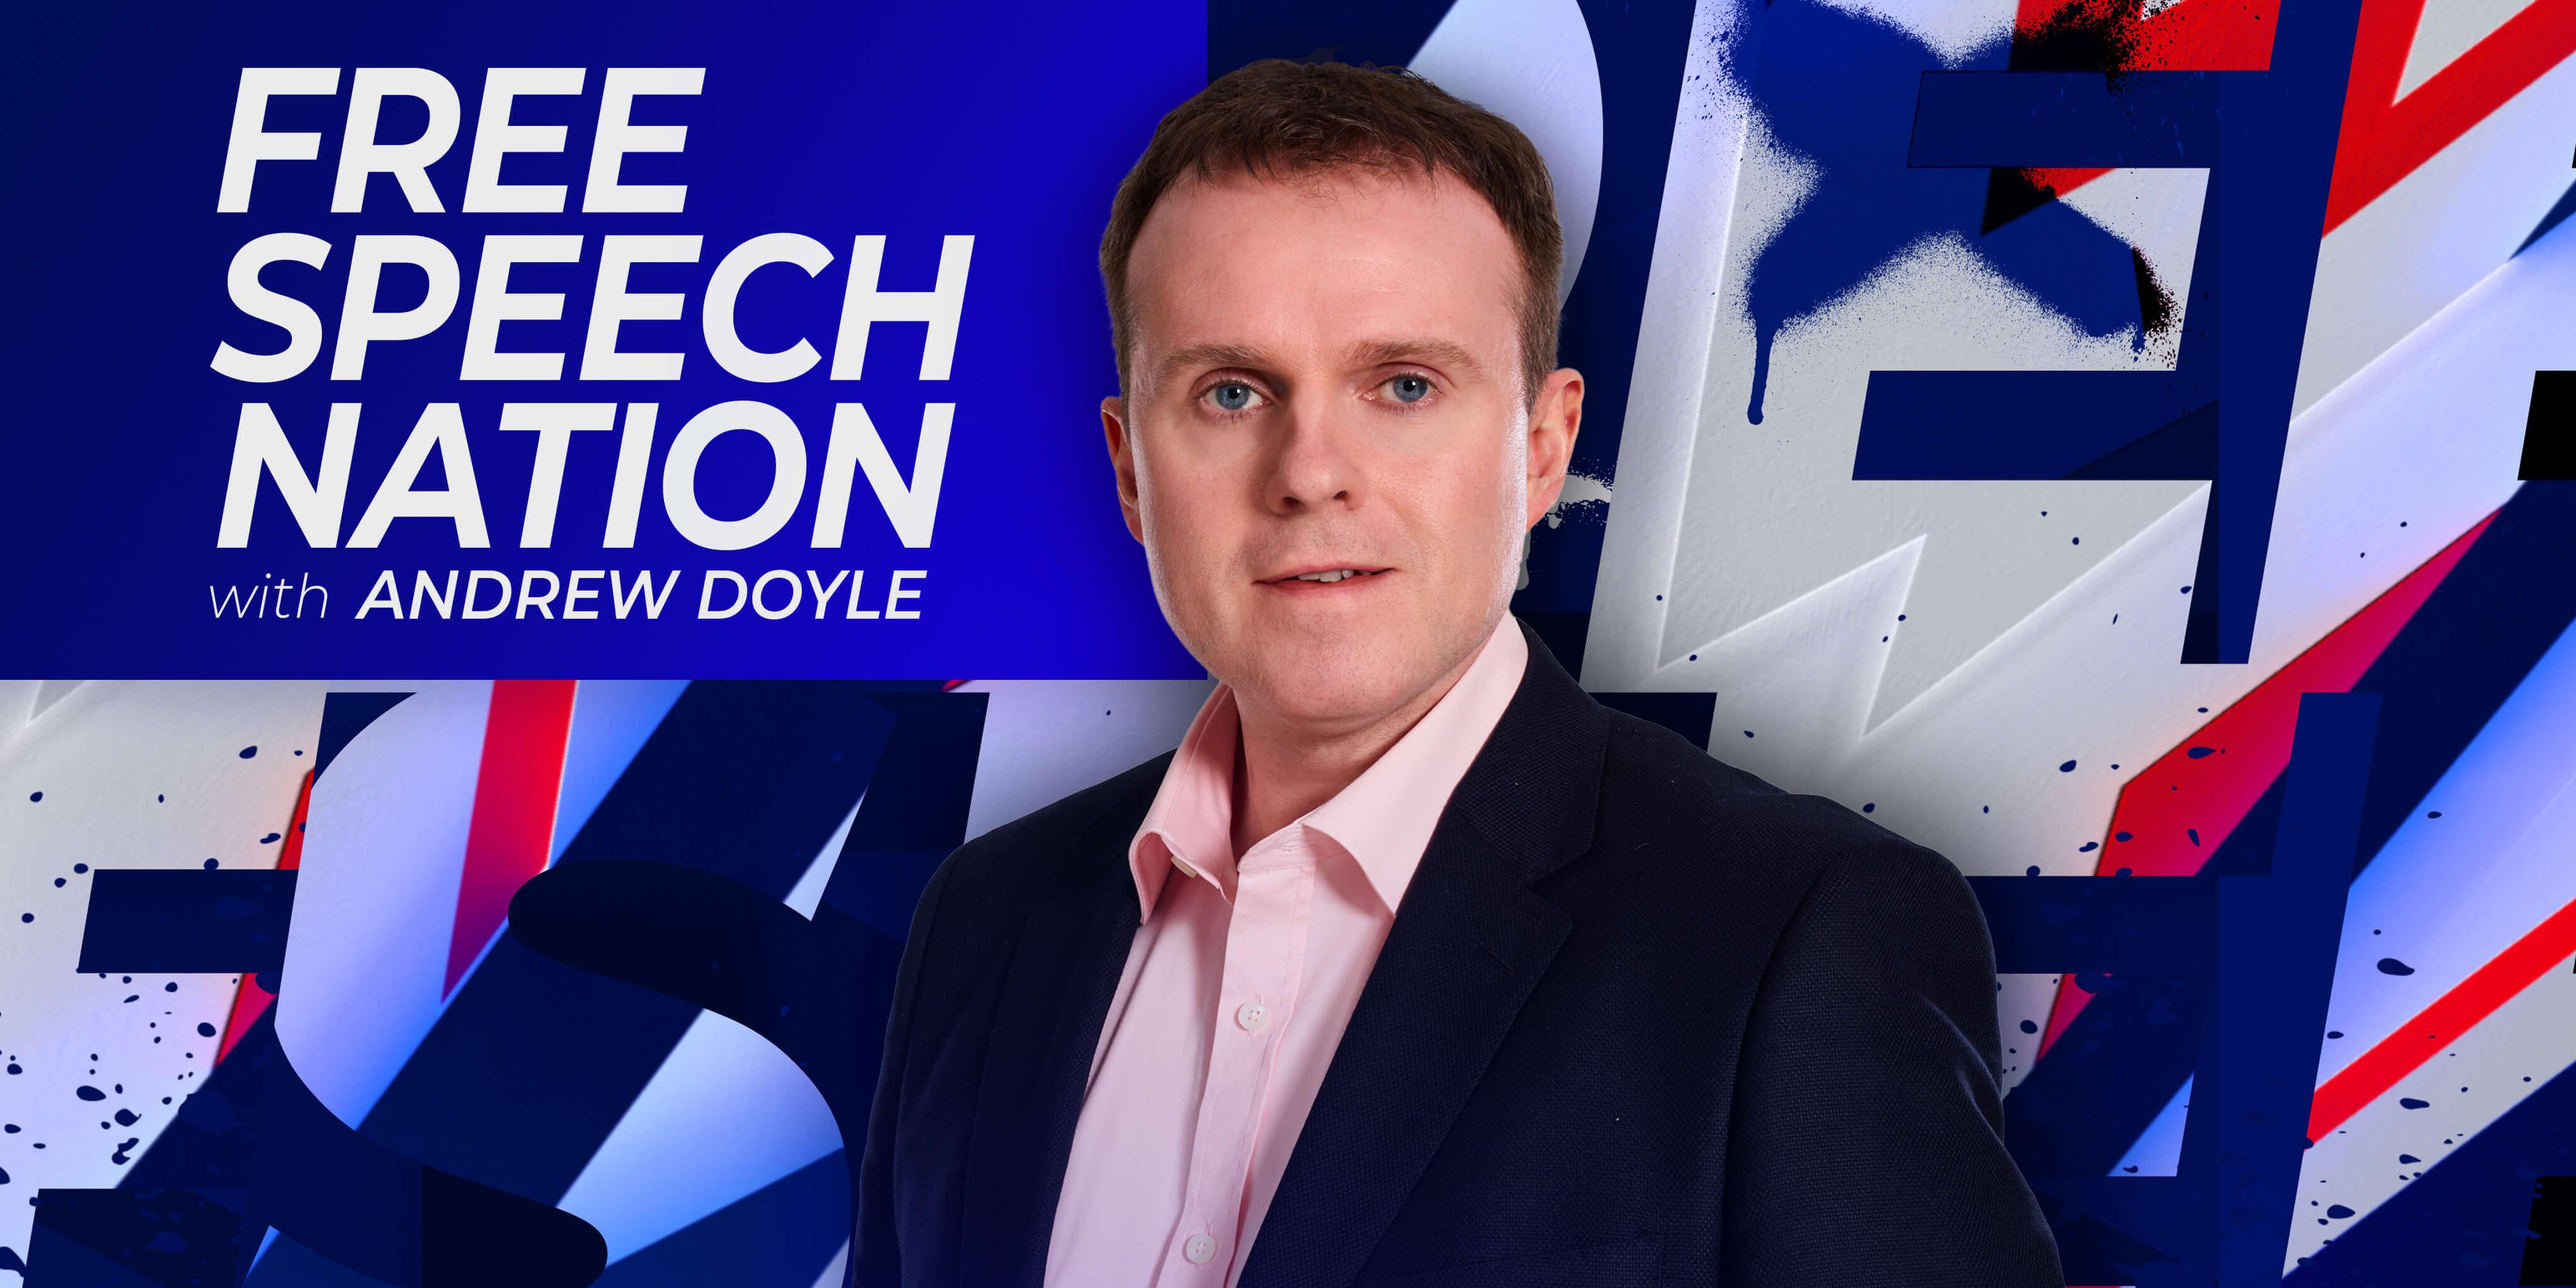 andrew doyle free speech nation